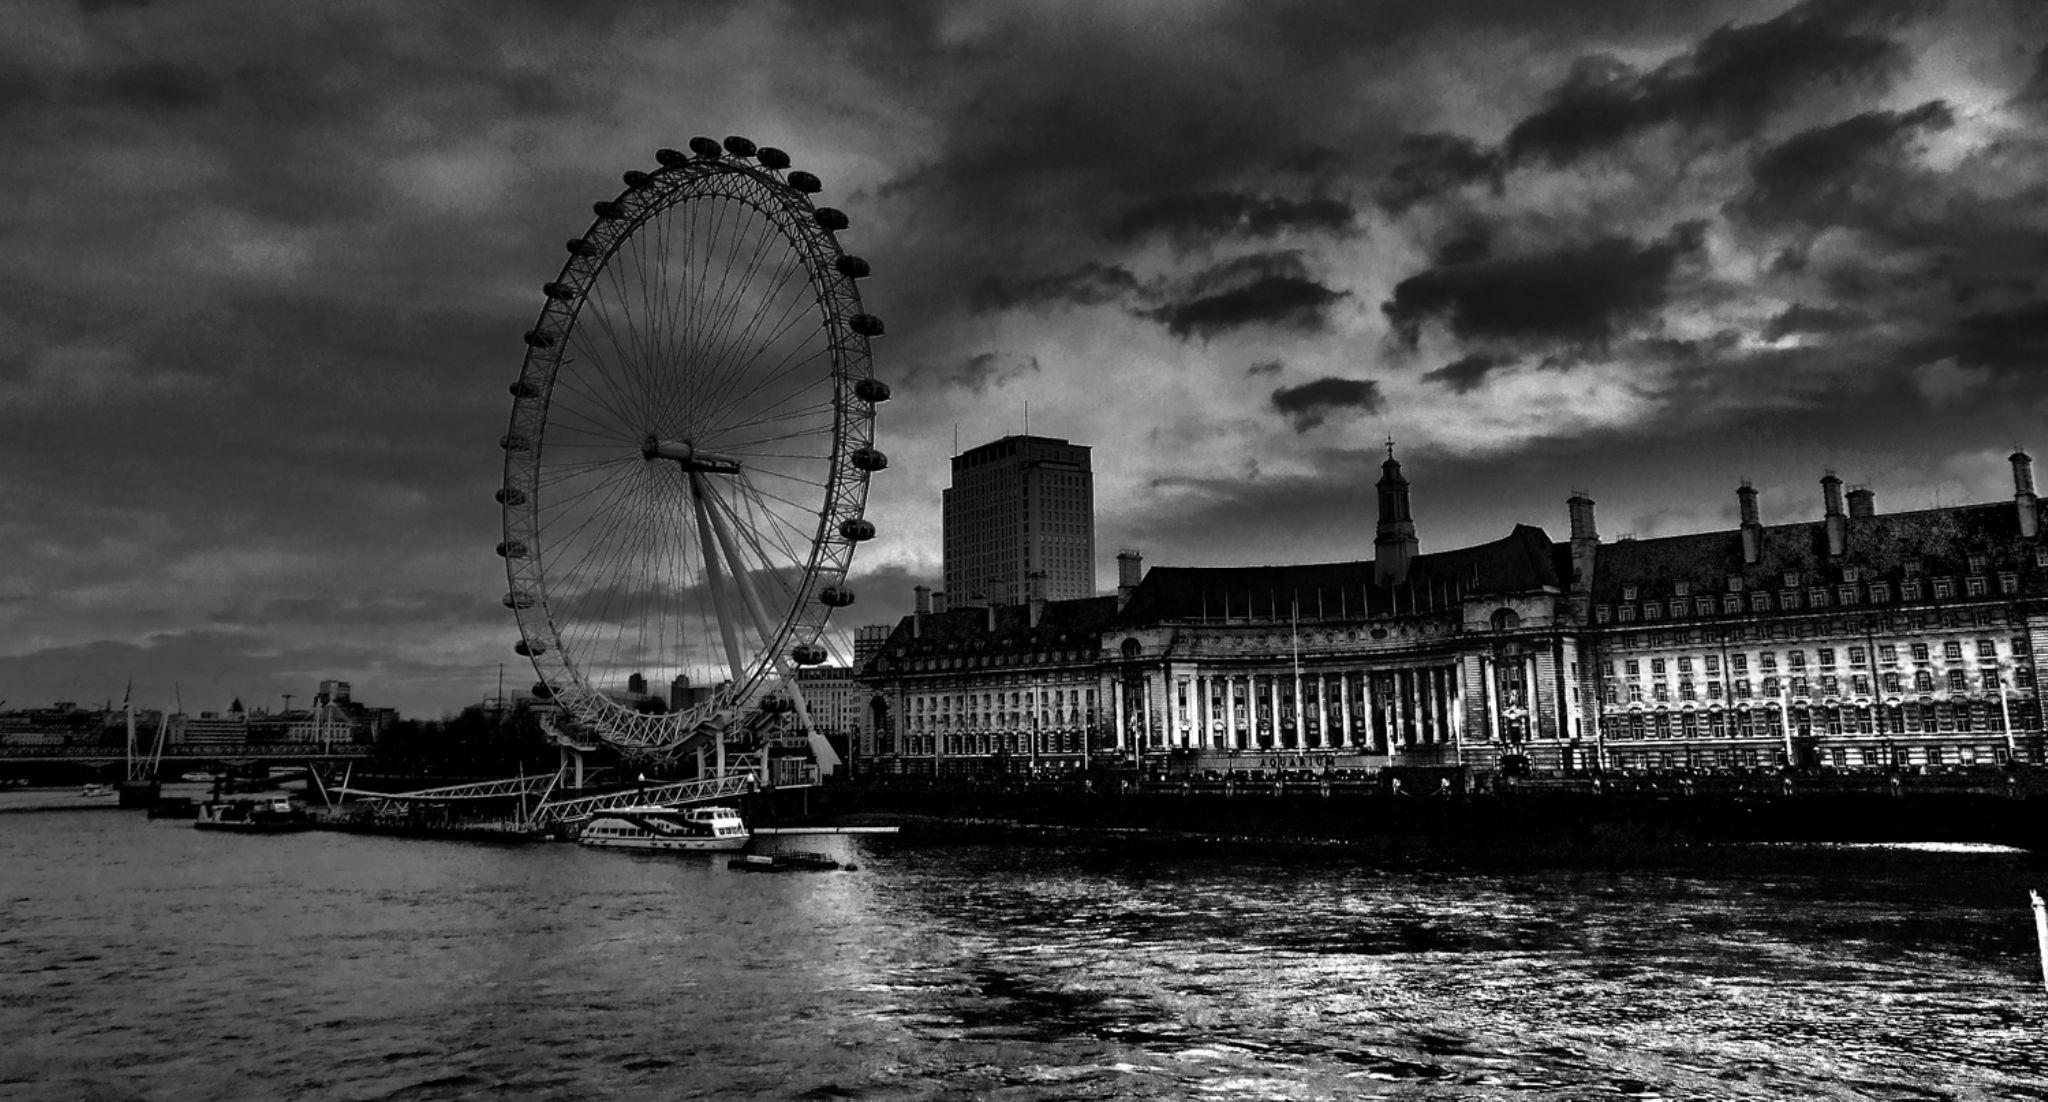 London eye by wikizameryki